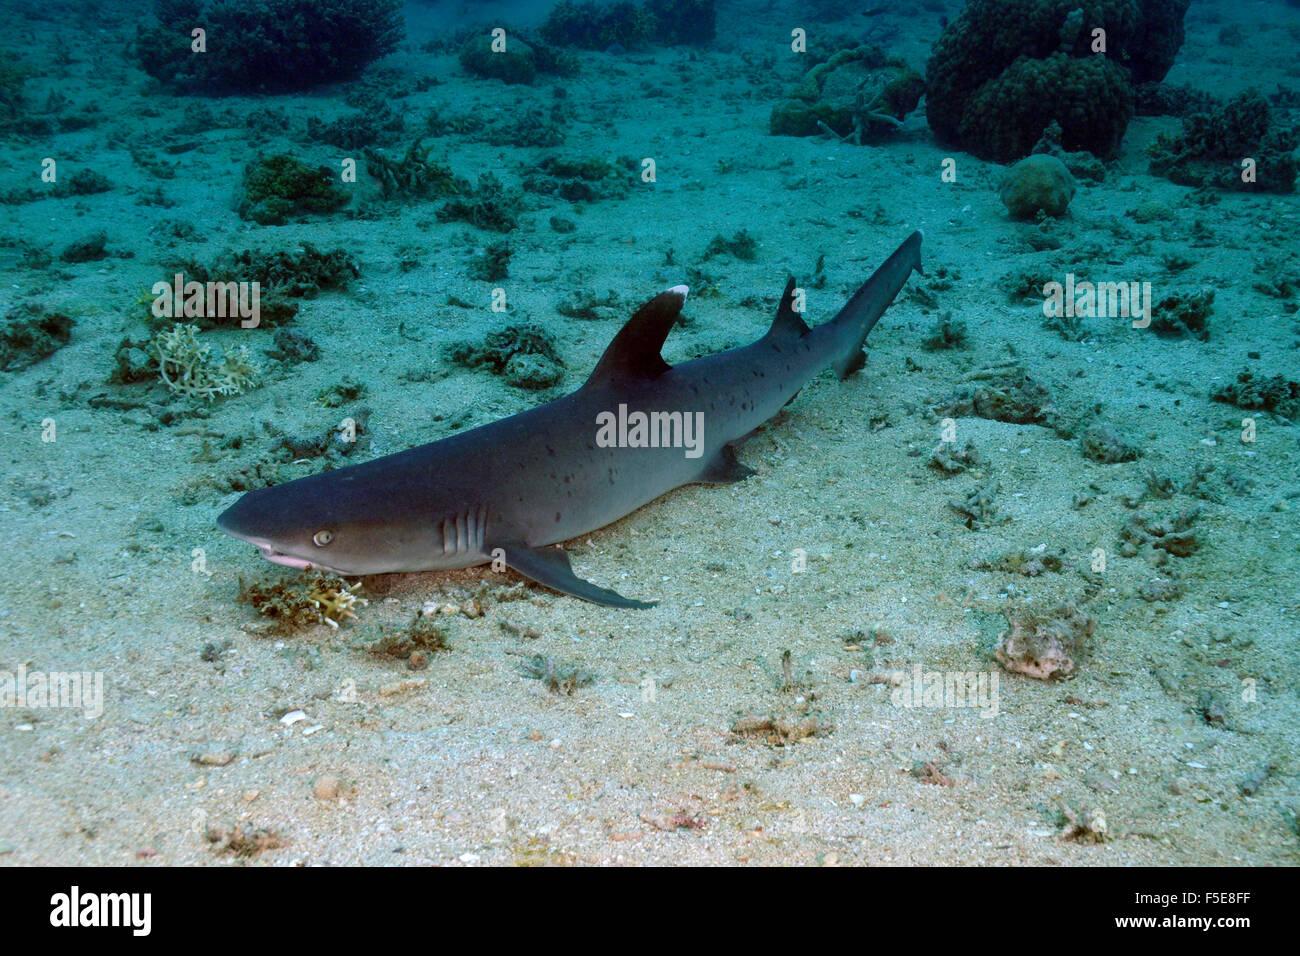 Whitetip reef shark, Triaenodon obesus, Seche Croissant, Noumea, New Caledonia - Stock Image